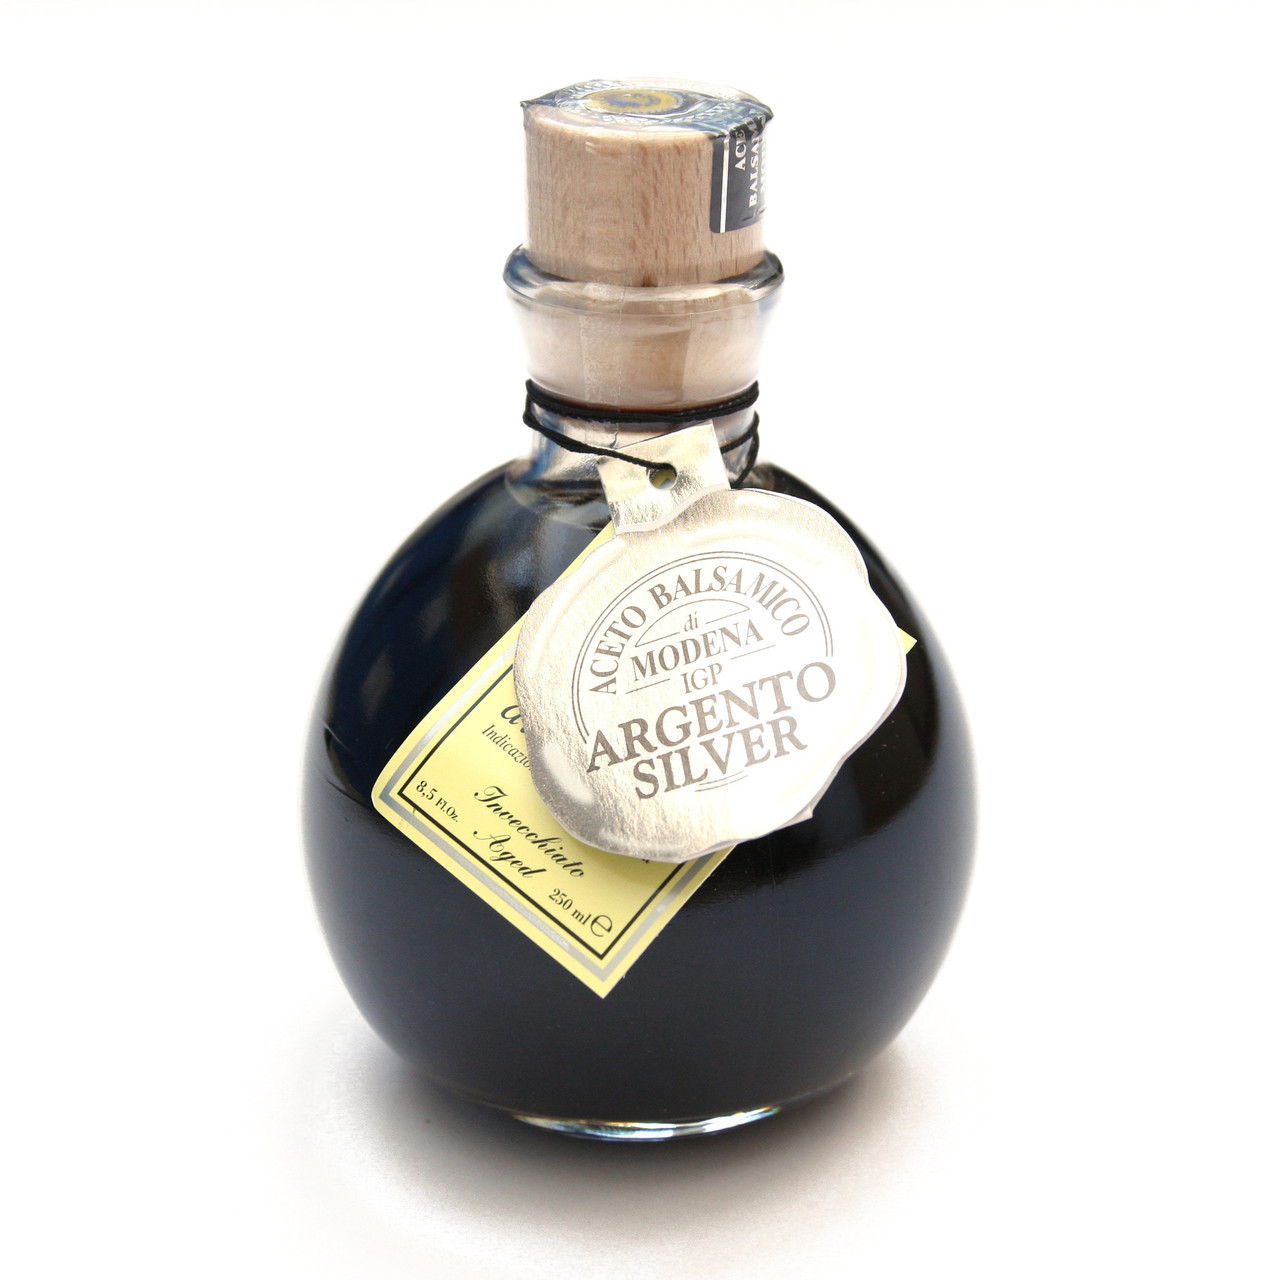 10 year balsamic vinegar